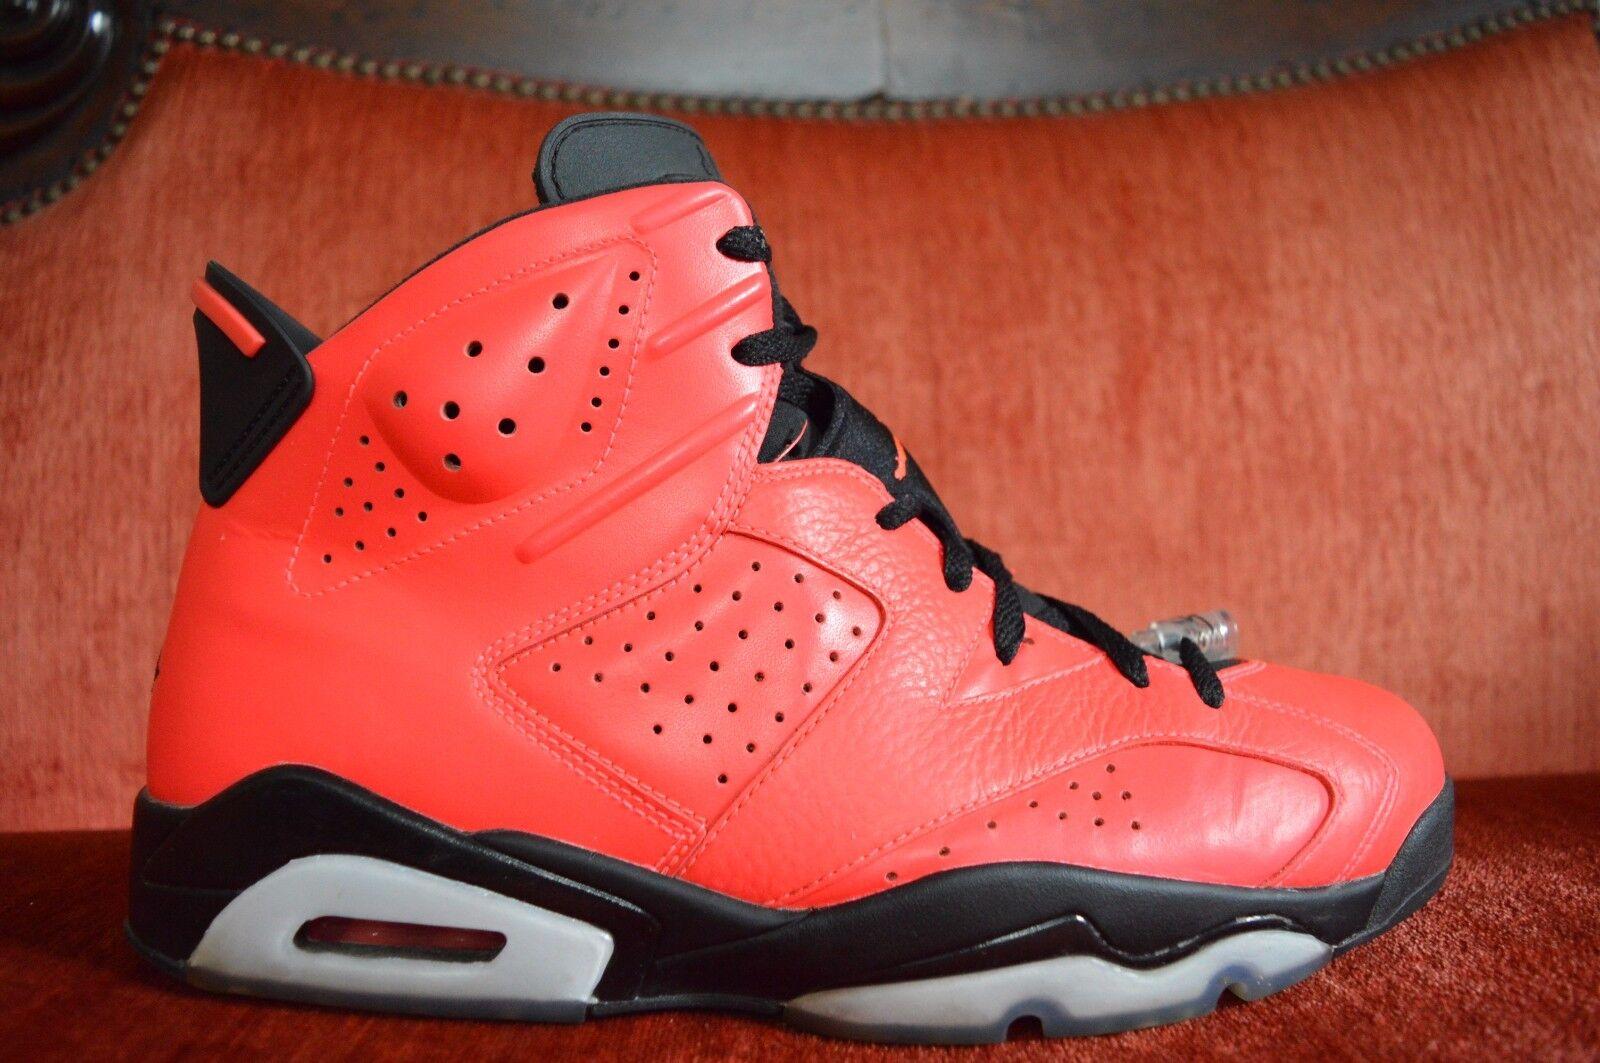 Nike air jordan 6 vi infrarossa infrarossi 23 toro nero taglia 12 9 / 10 rosso